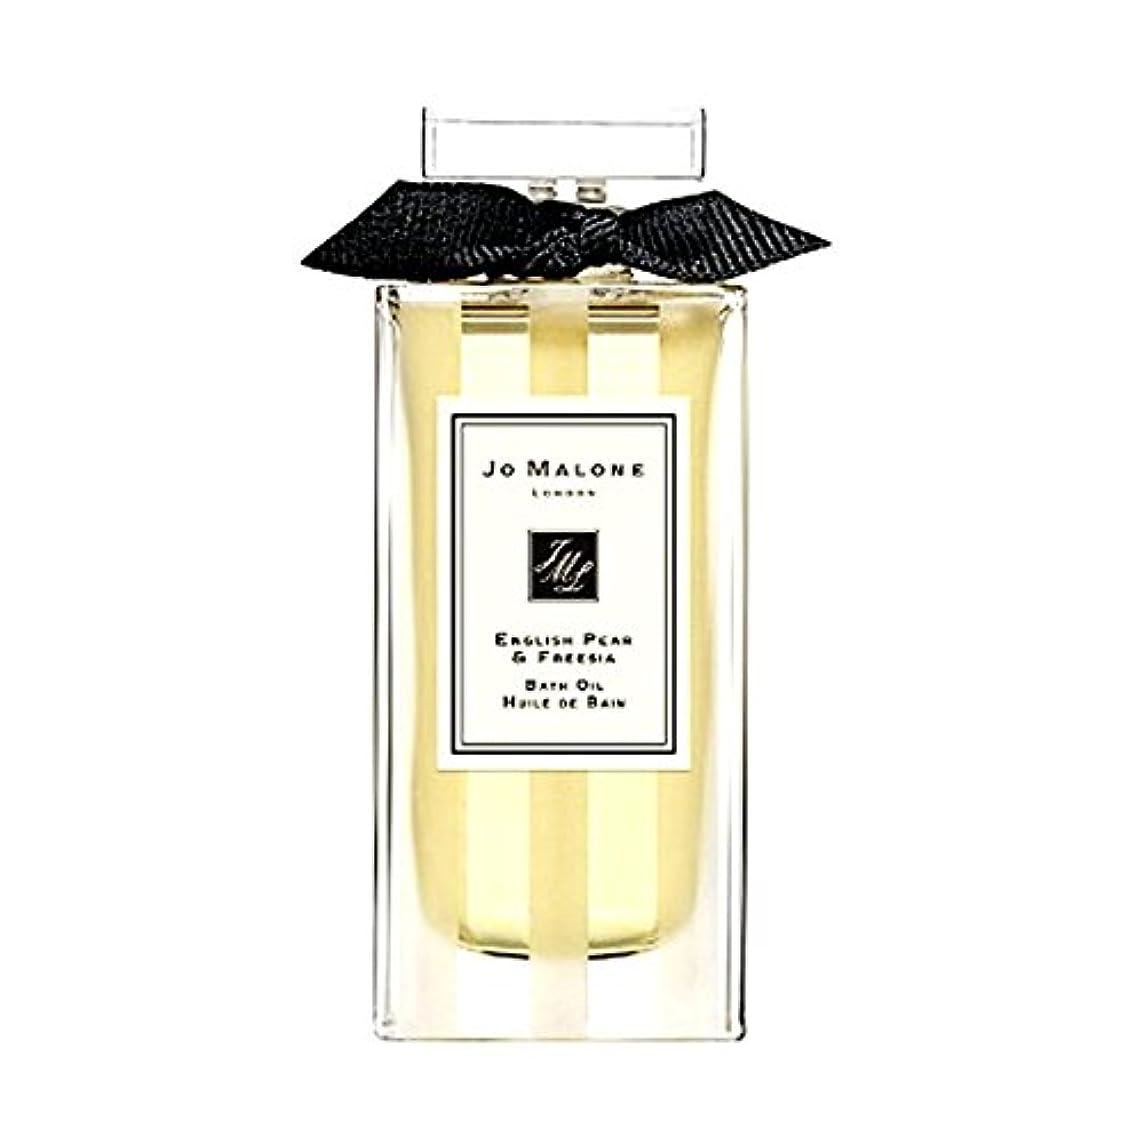 Jo Maloneジョーマローン, バスオイル -英語梨&フリージア (30ml),' English Pear & Freesia' Bath Oil (1oz) [海外直送品] [並行輸入品]